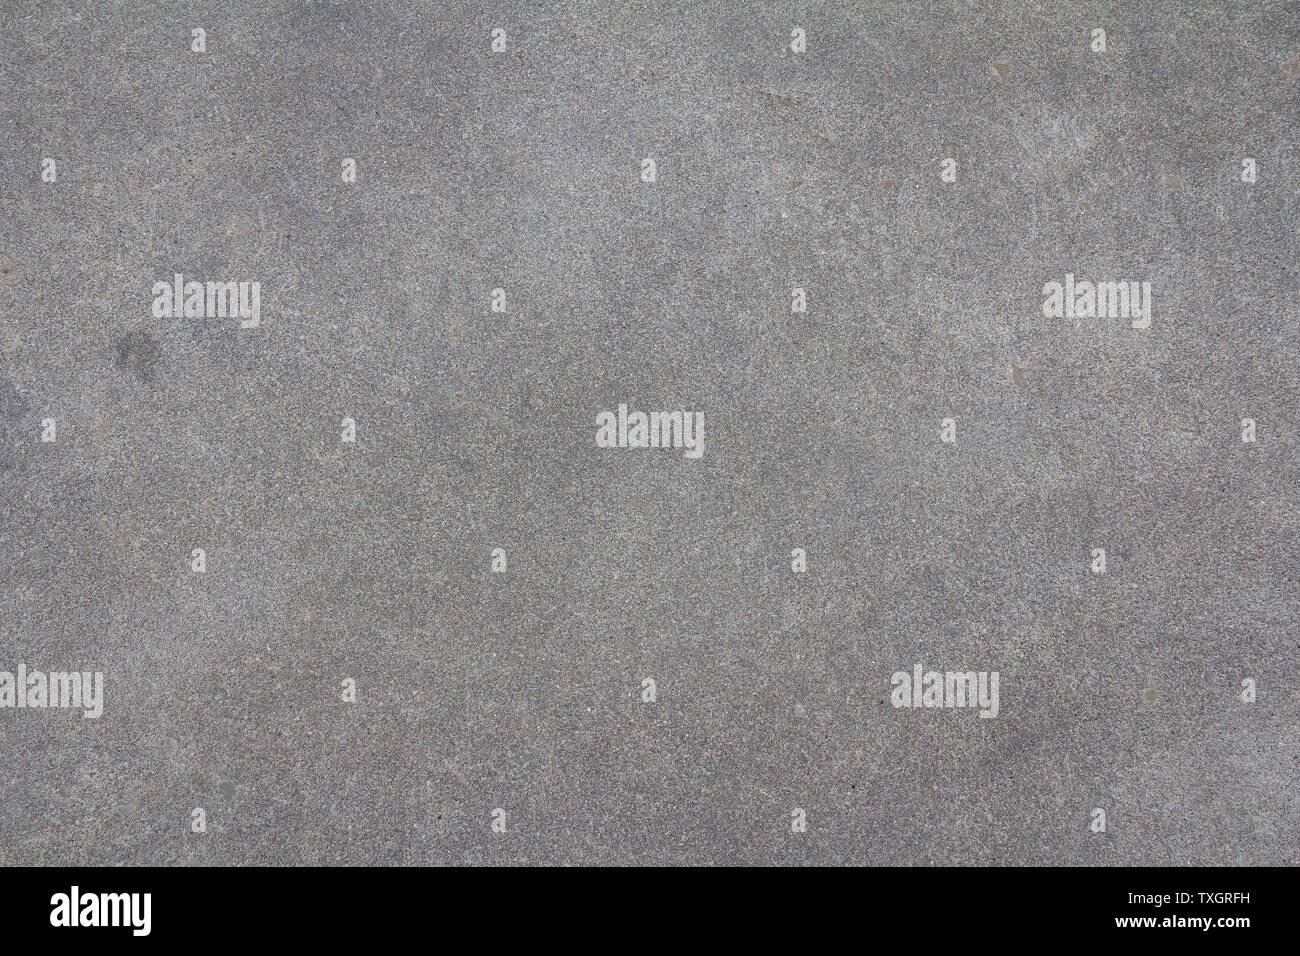 Bevorzugt Glatte Betonoberfläche Stockfotos & Glatte Betonoberfläche Bilder BA29